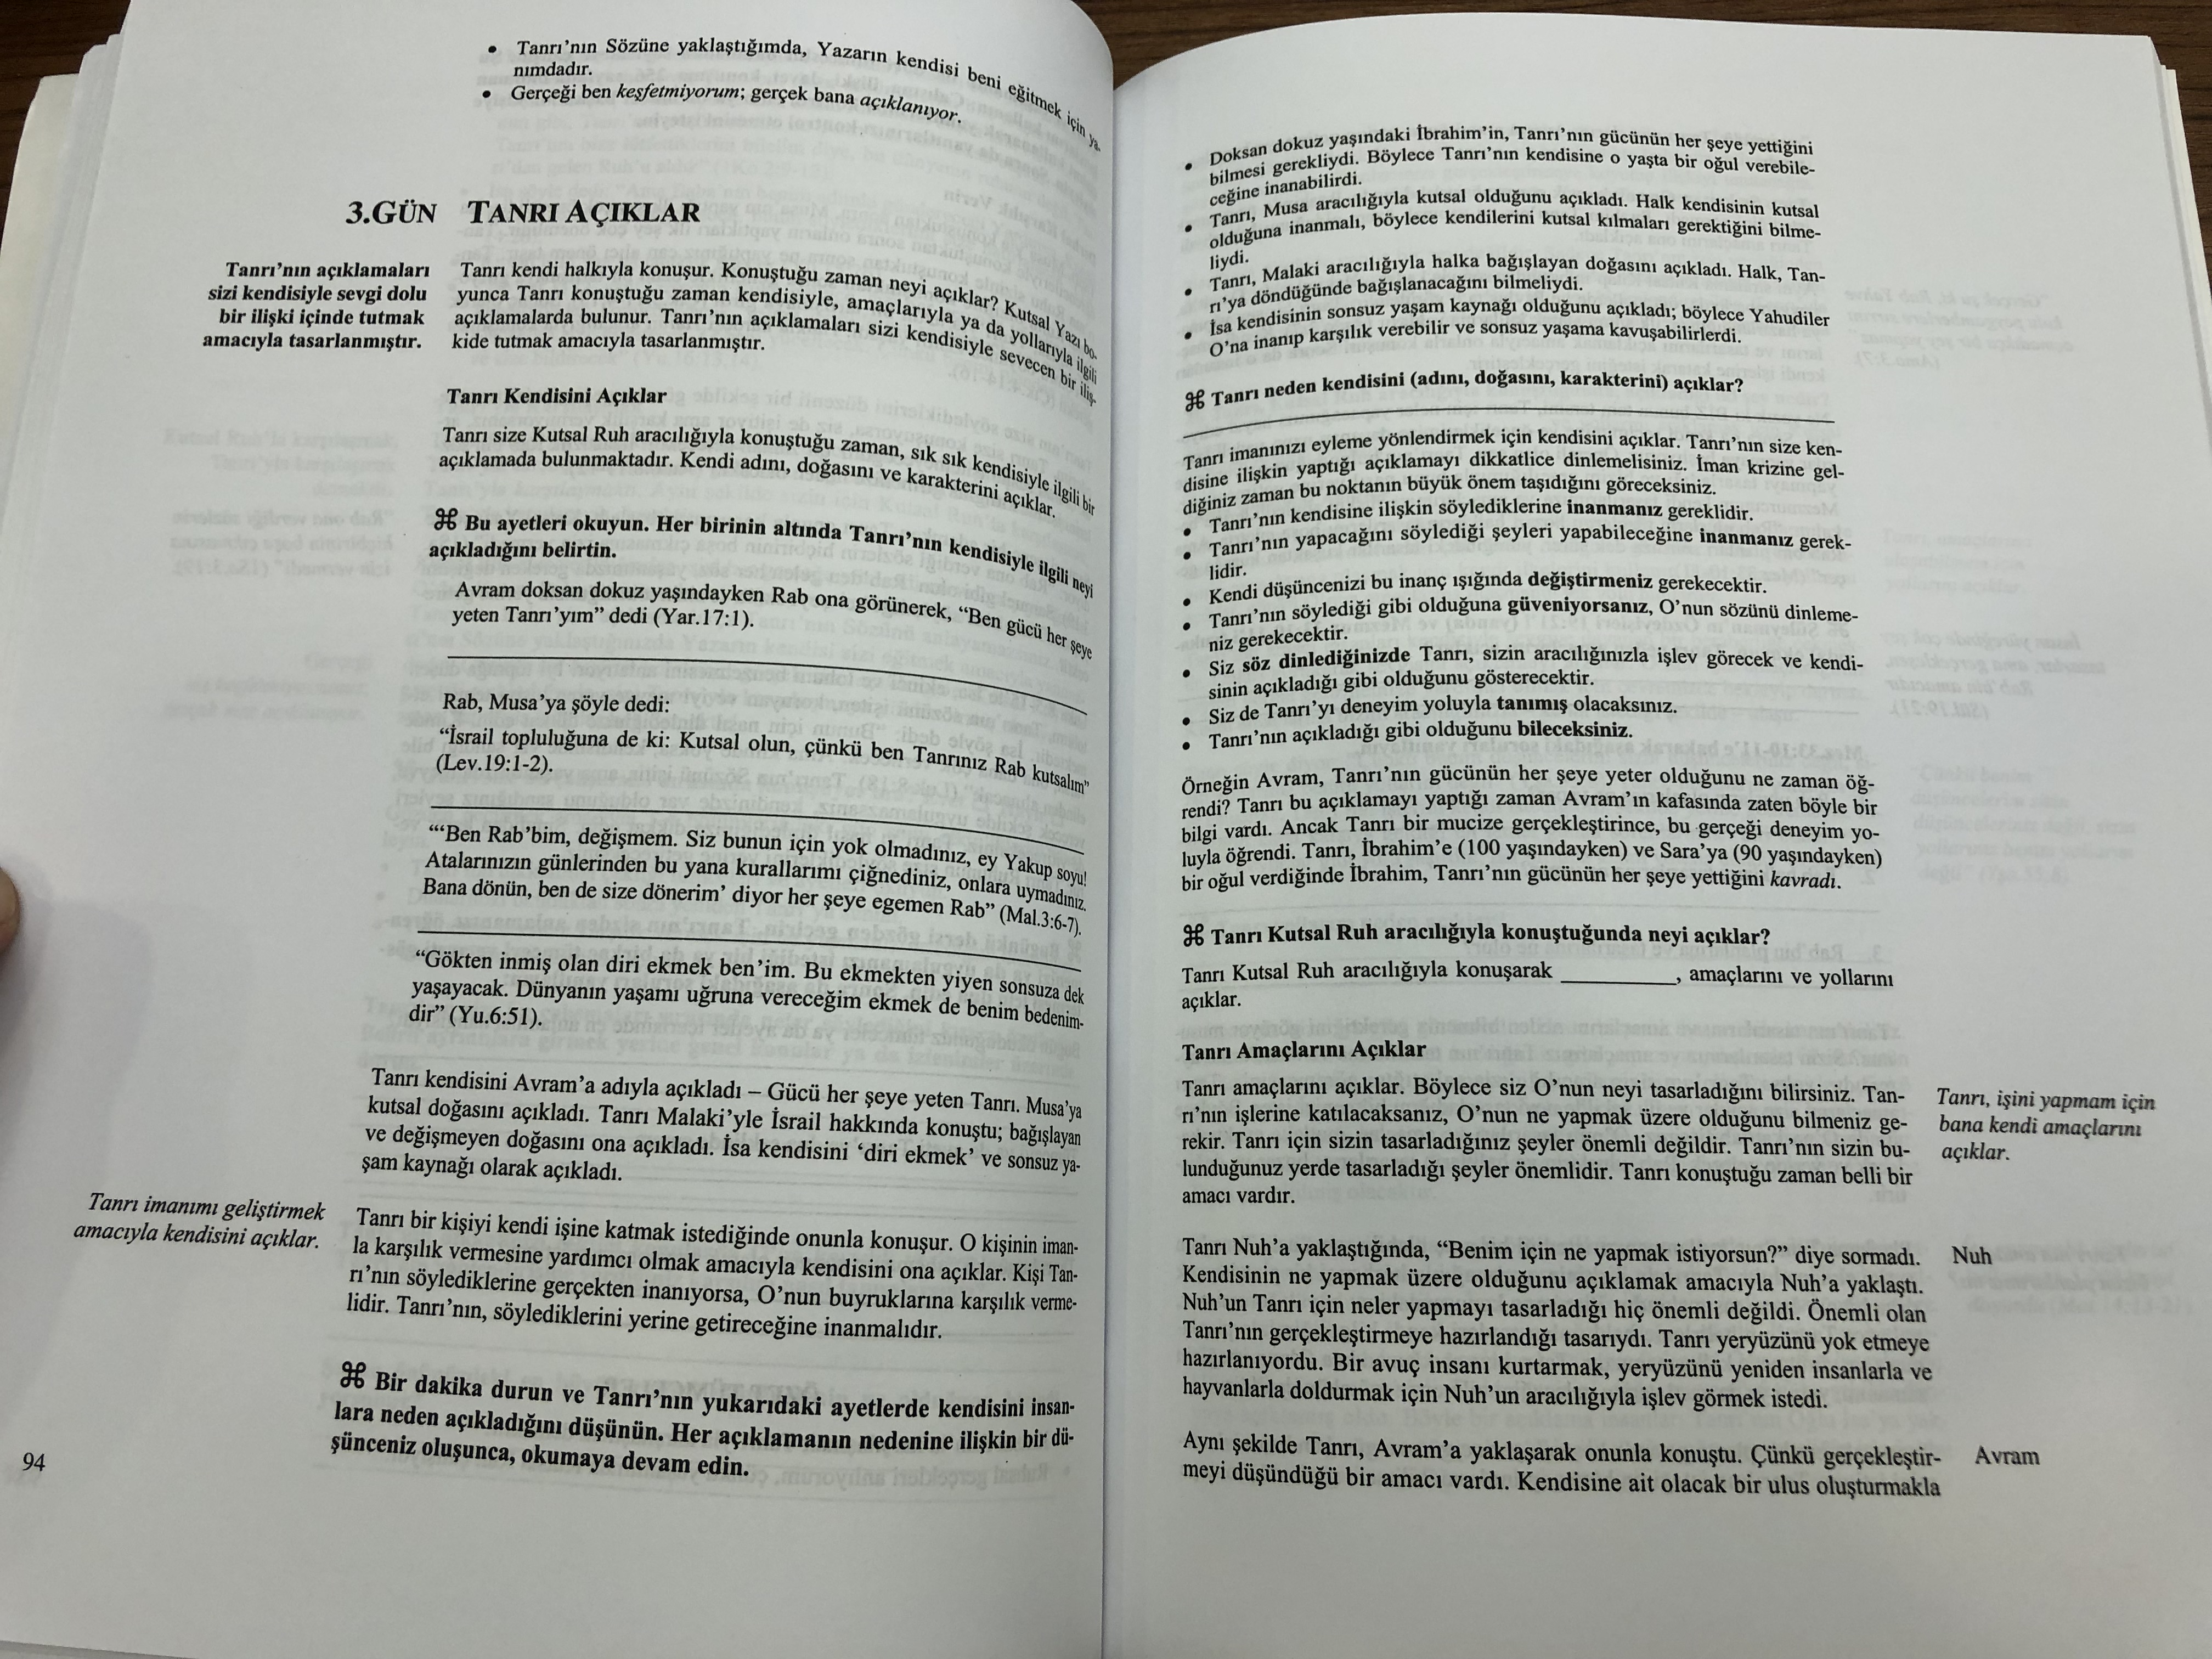 tanri-yi-ya-amak-tanri-nin-iste-ini-bilmek-ve-uygulamak-by-henry-t.-blackaby-claude-v.-king-turkish-translation-of-experiencing-god-knowing-and-doing-the-will-of-god-yeni-ya-am-yayinlari-paperback-2000-6-.jpg